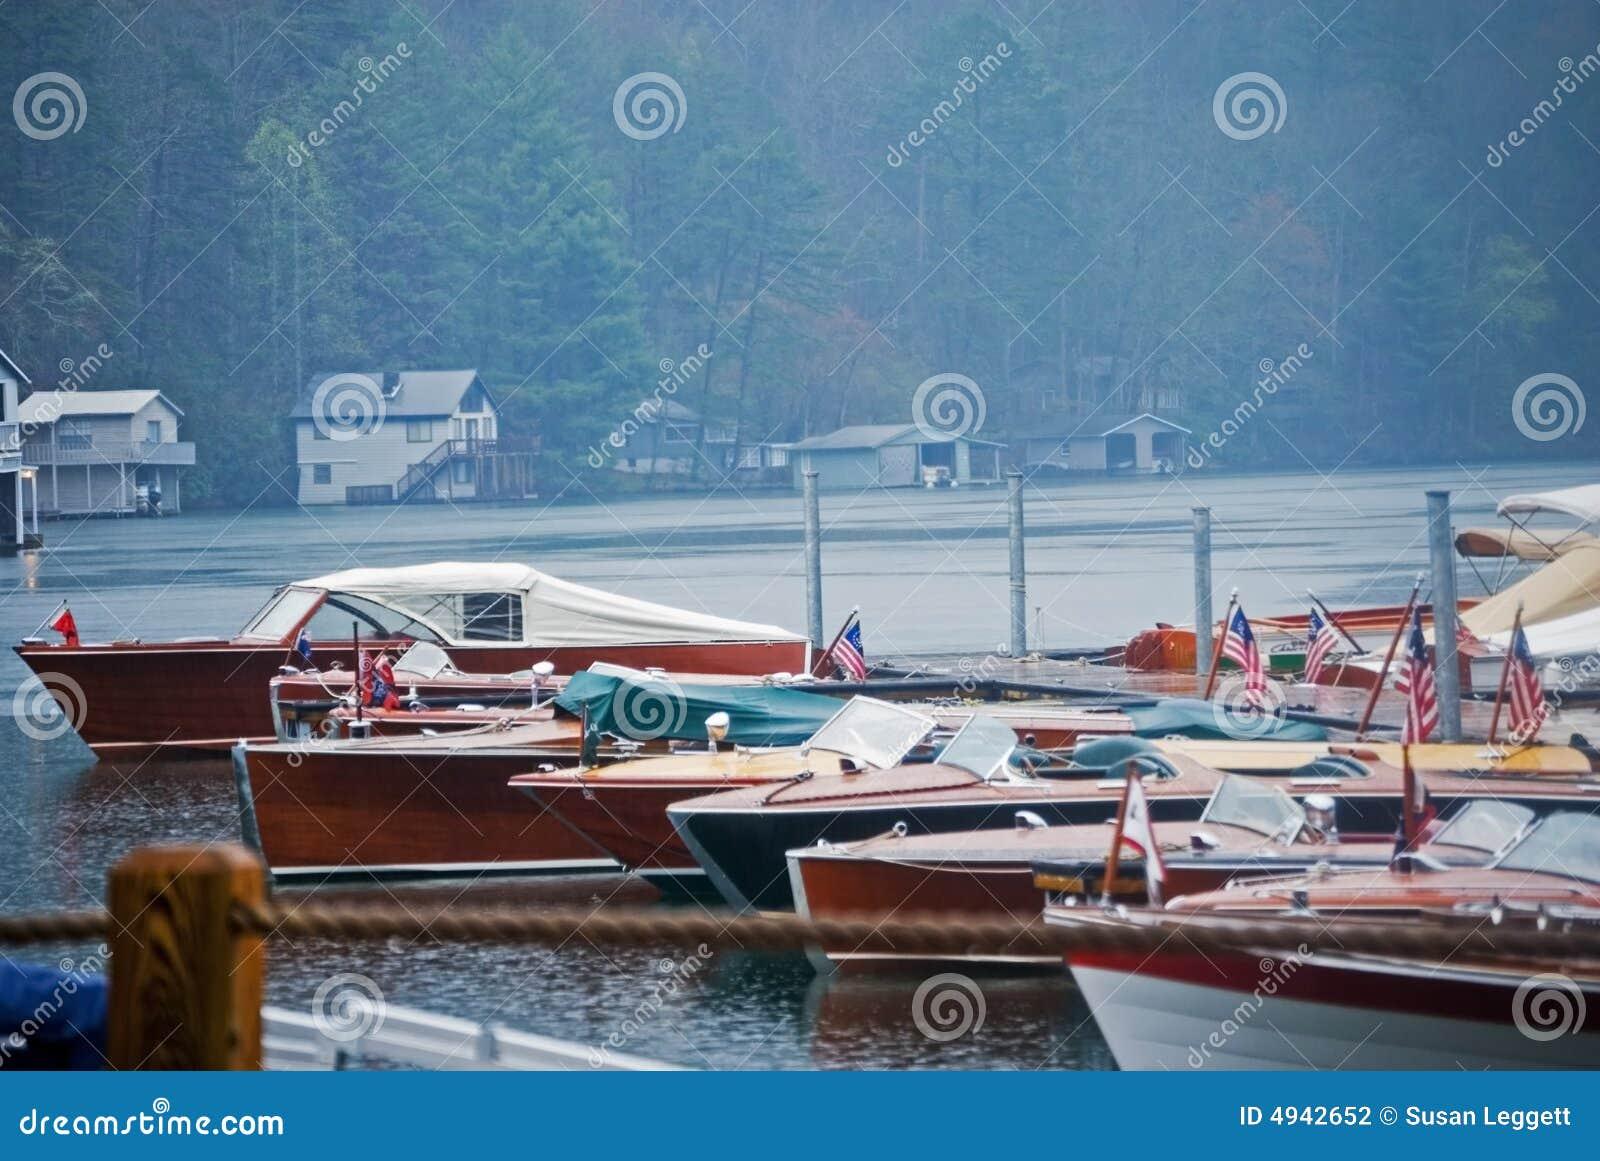 Wood Boats in the Rain